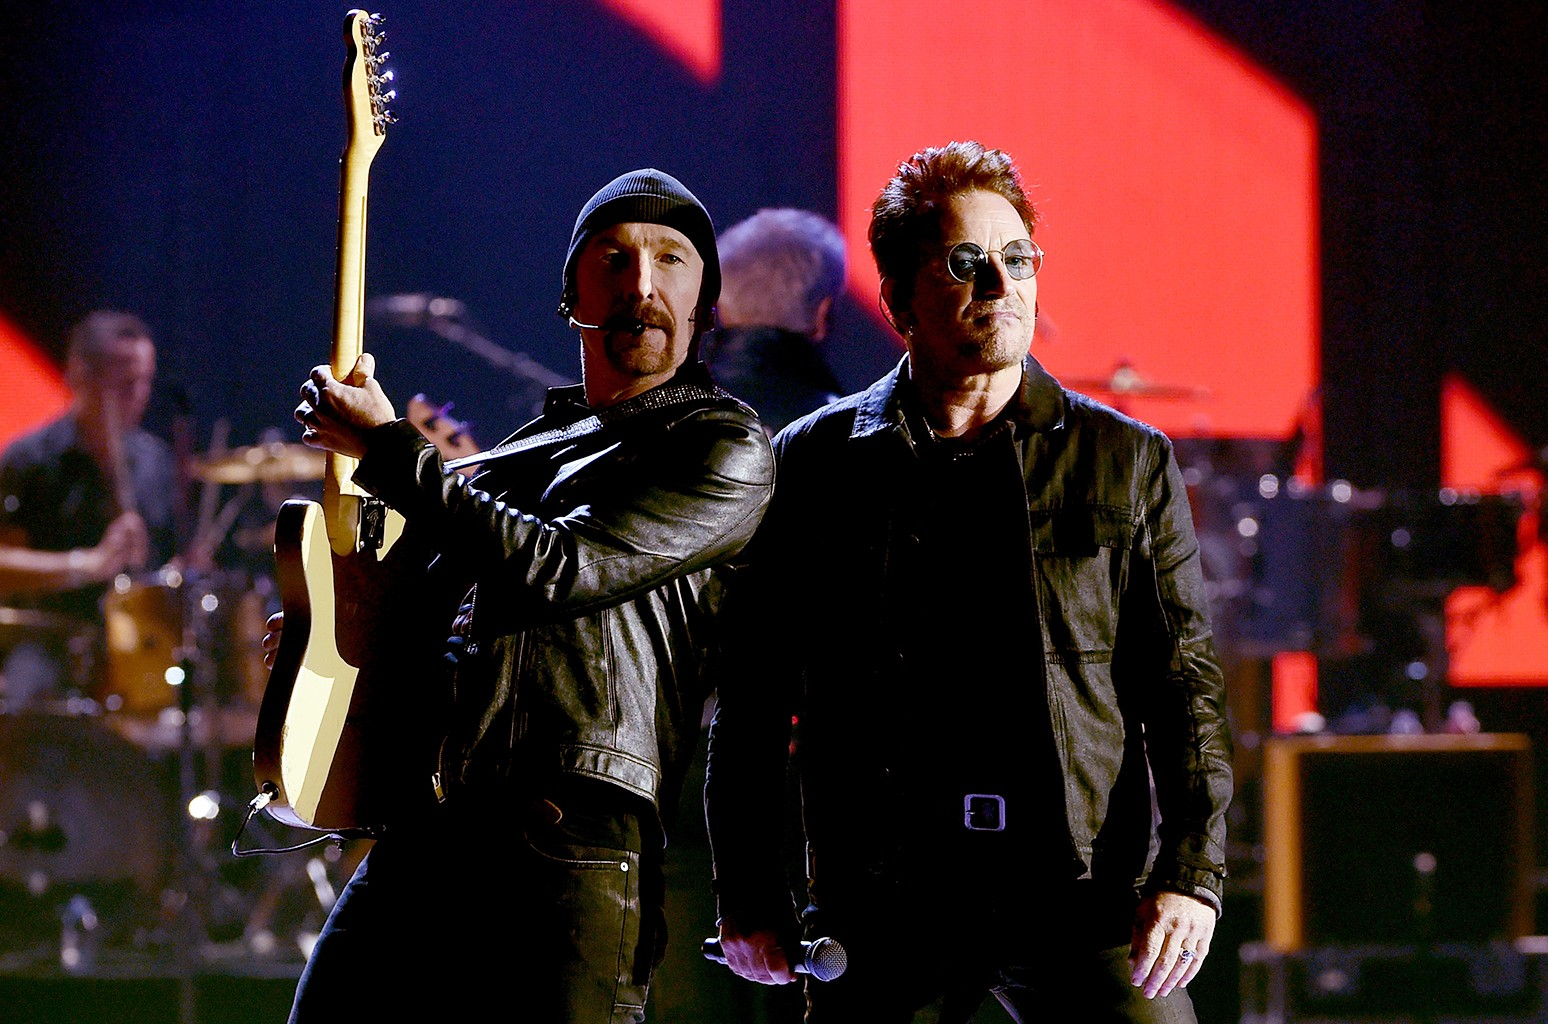 The Edge and Bono of U2